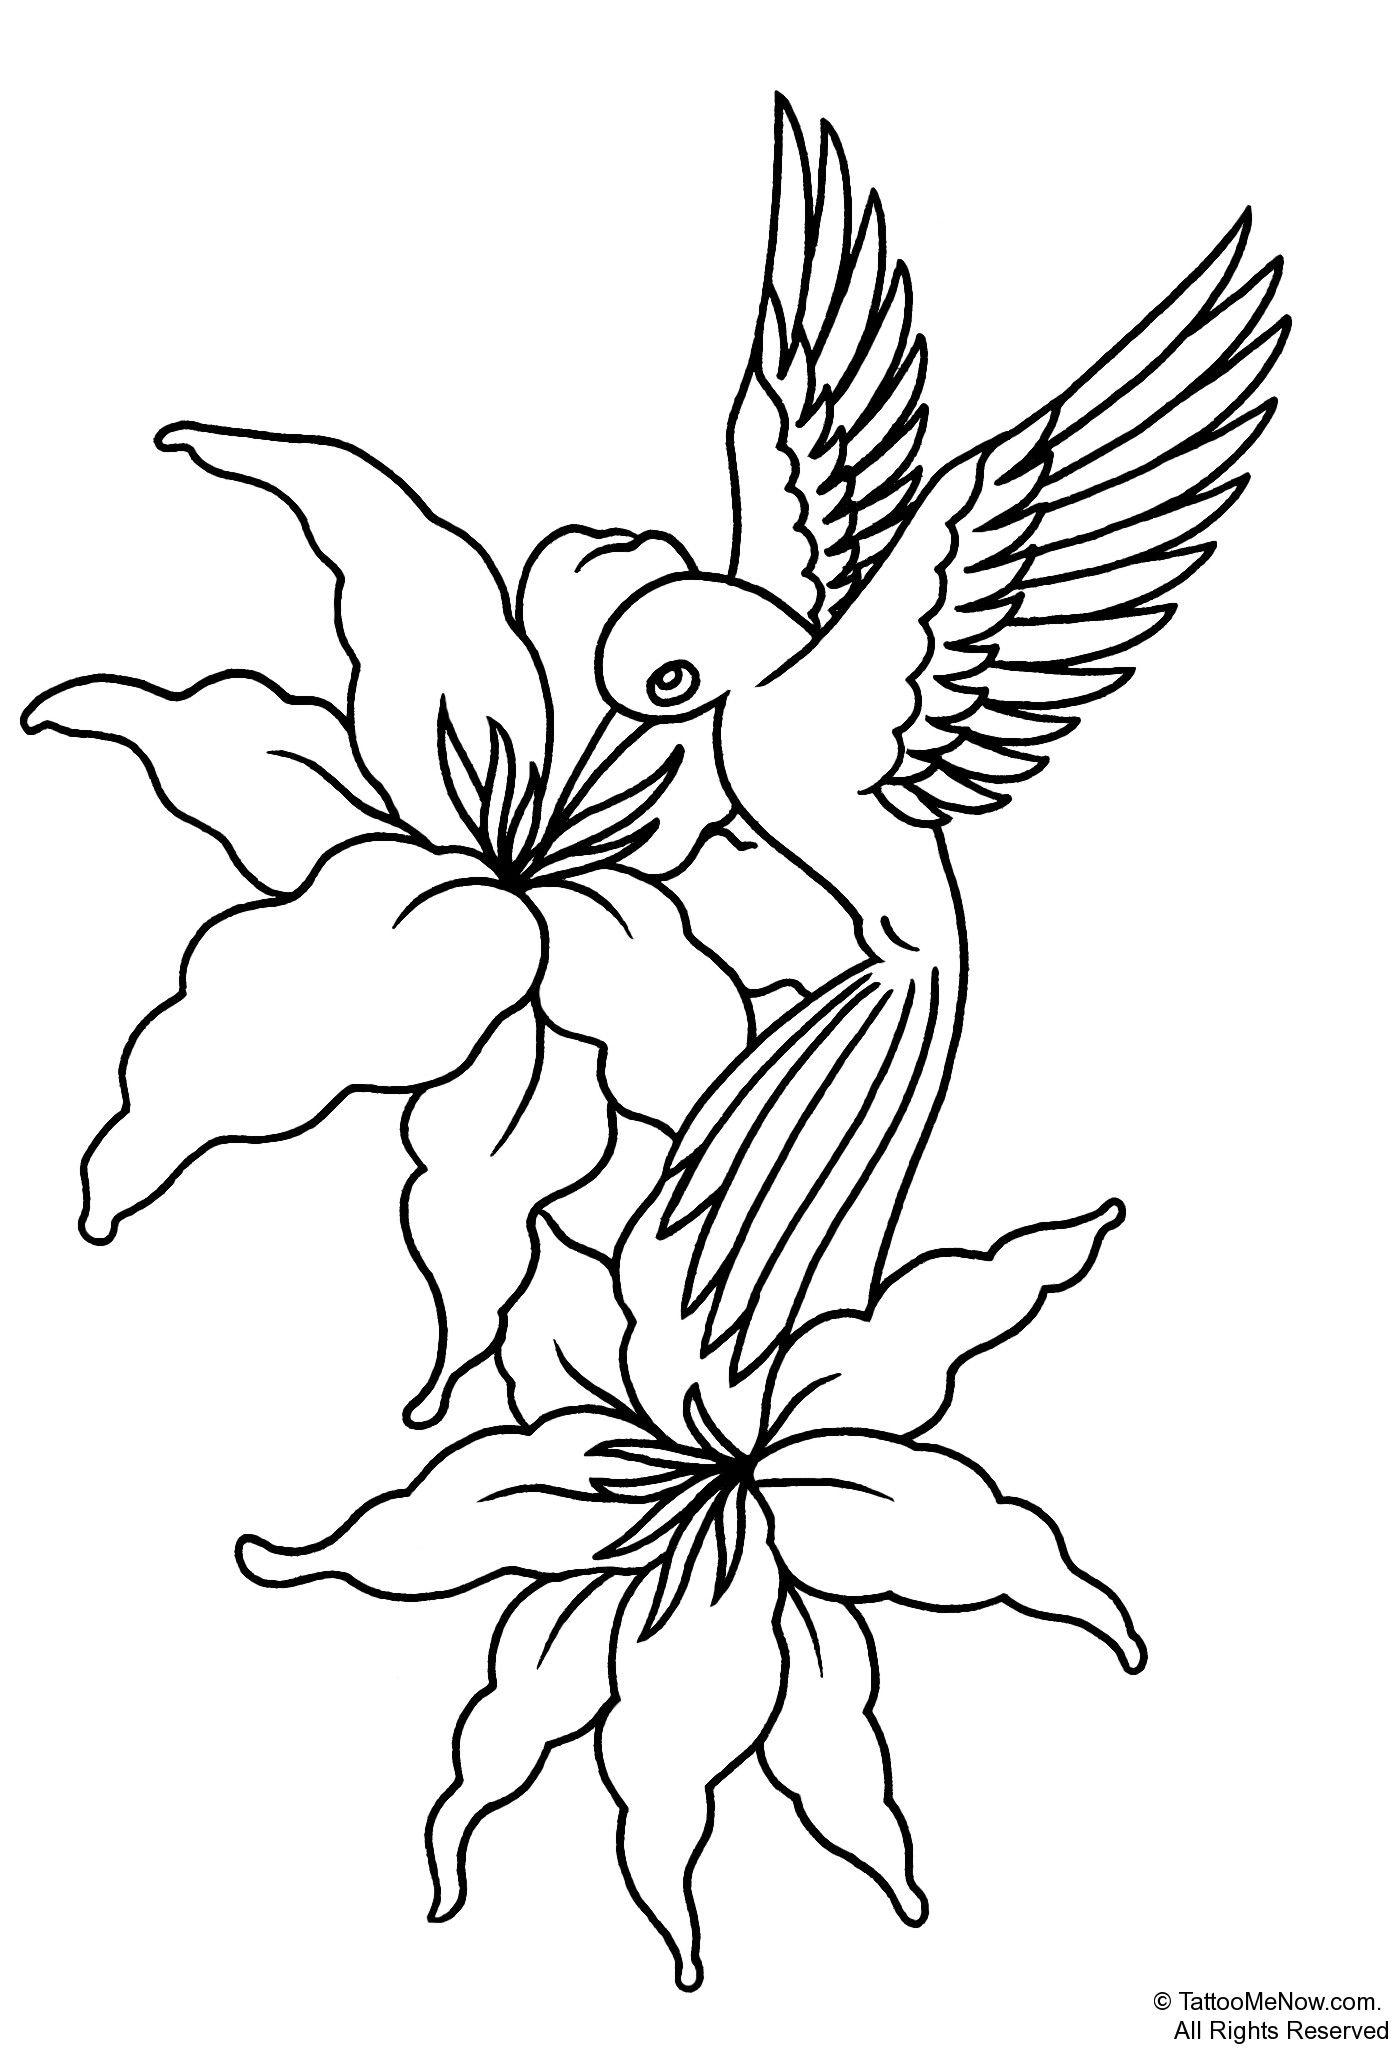 Free Printable Tattoo Stencils | Your Free Tattoo Designs & Stencils - Free Printable Tattoo Designs